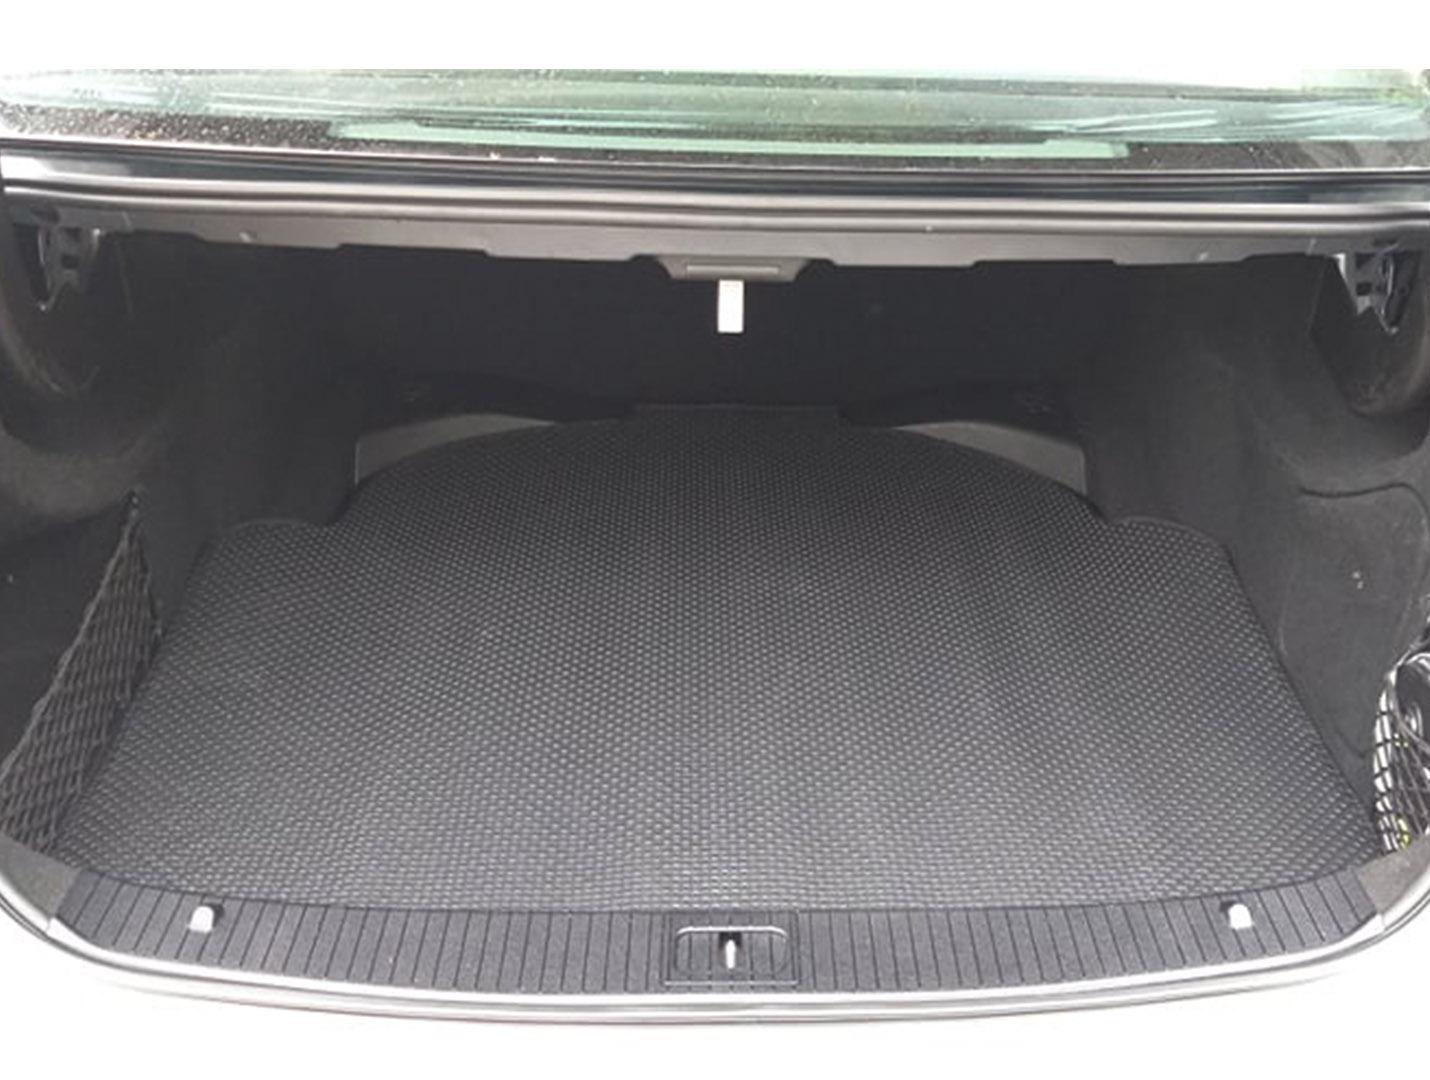 Thảm lót cốp Mercedes E Class W212